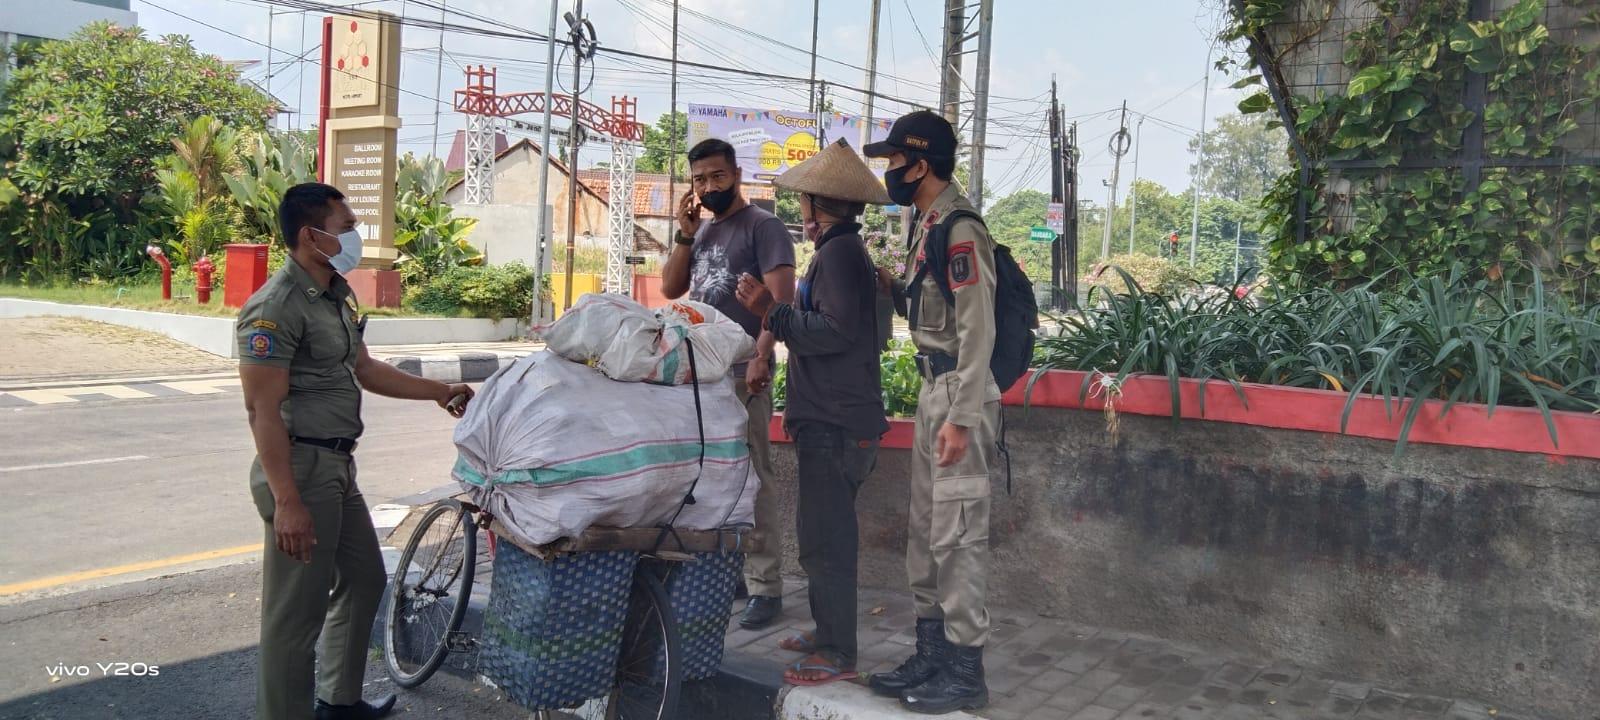 Petugas Satpol PP Semarang saat mengamankan salah satu manusia karung di jalan sekitaran imam bonjol, Tito Isna Utama / Lingkar.co